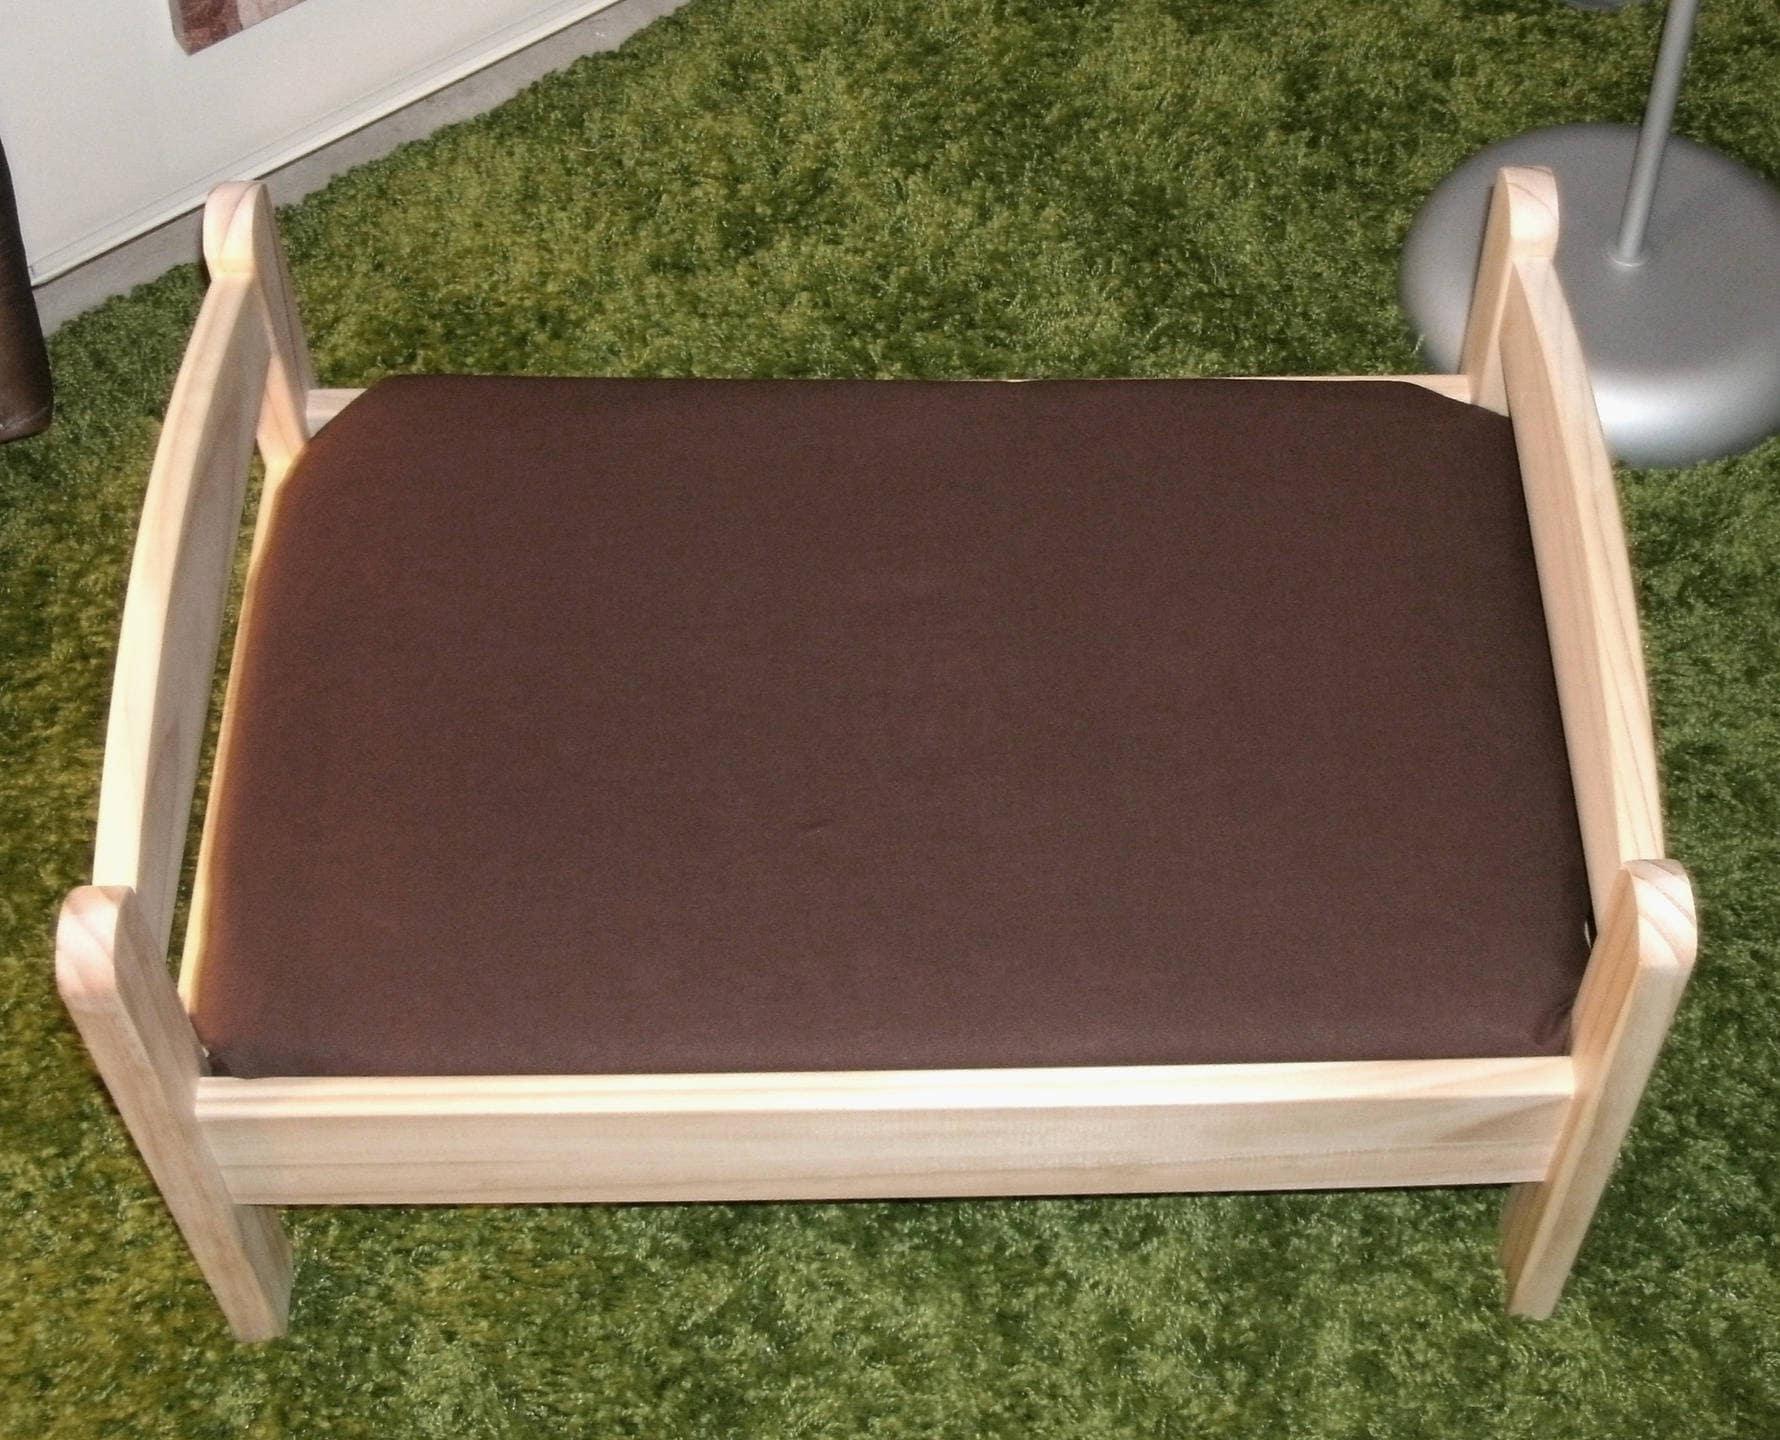 drap housse 60 x 120 cm lit volutif enfant b b. Black Bedroom Furniture Sets. Home Design Ideas